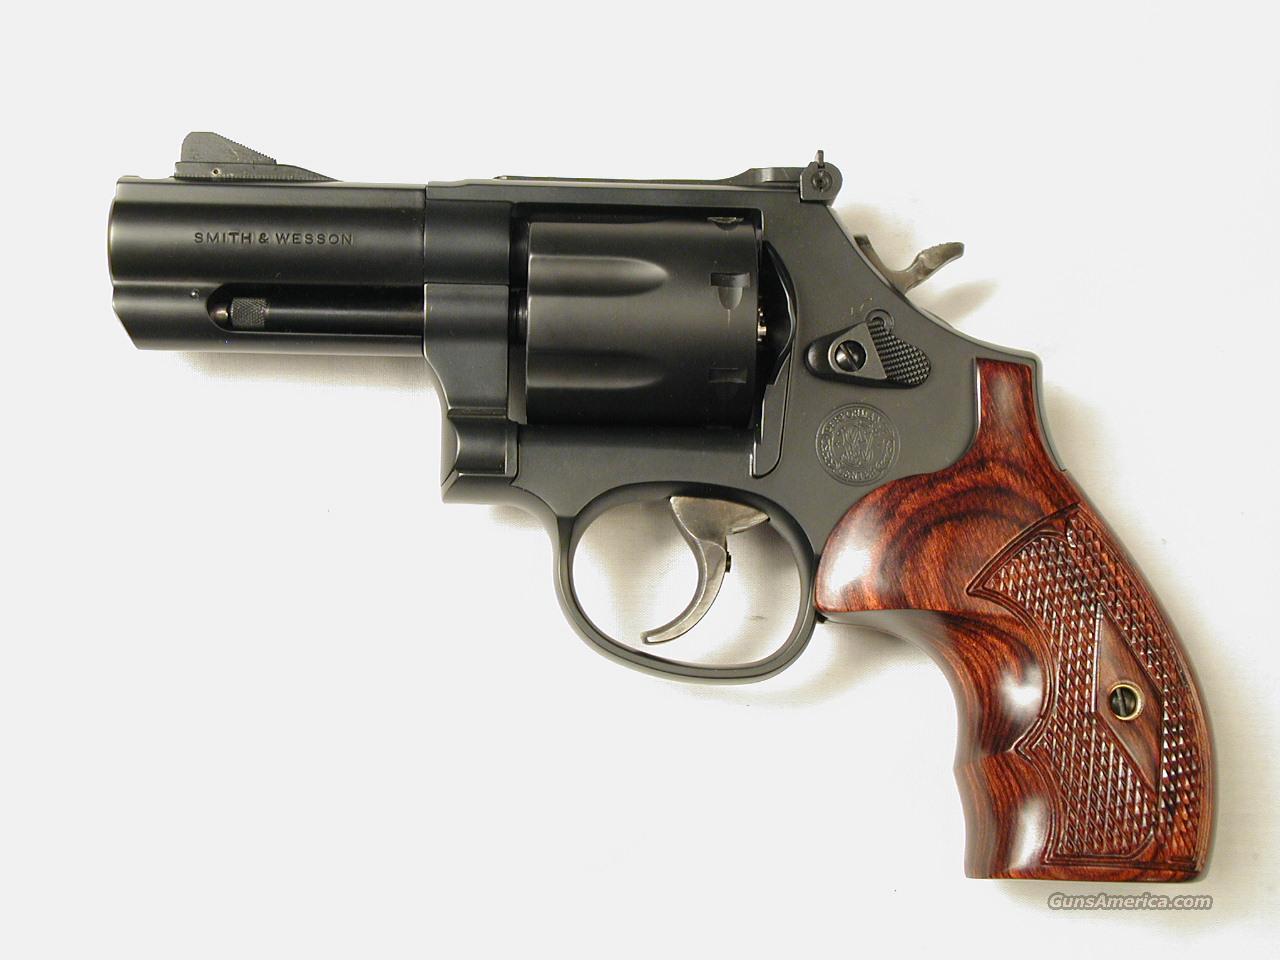 586 PC COMP GUN  Guns > Pistols > Smith & Wesson Revolvers > Performance Center